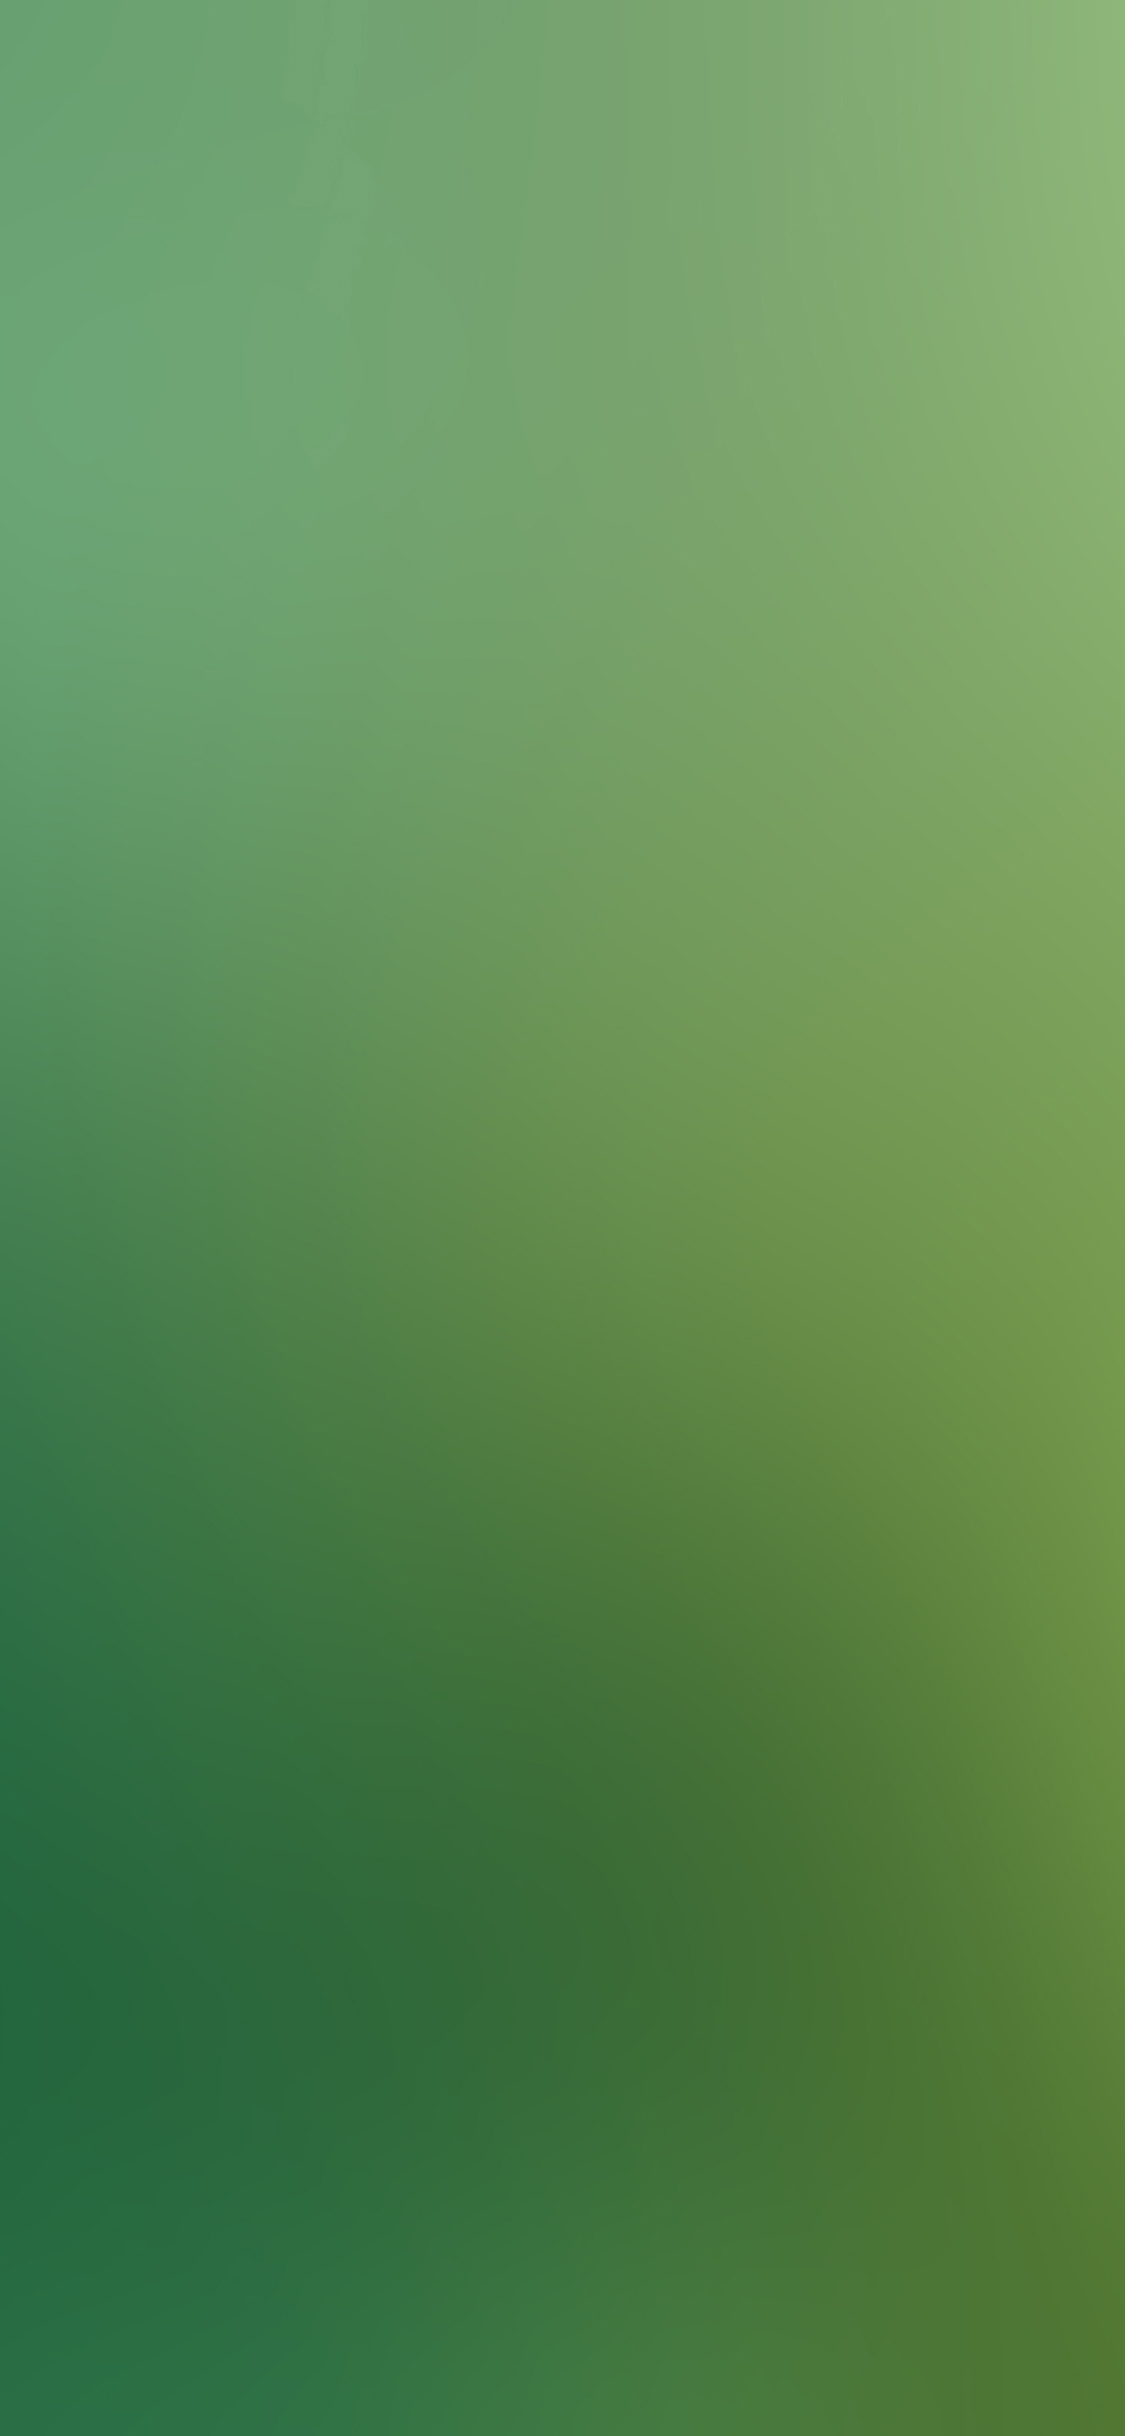 iPhoneXpapers.com-Apple-iPhone-wallpaper-sd67-green-peace-love-nature-gradation-blur